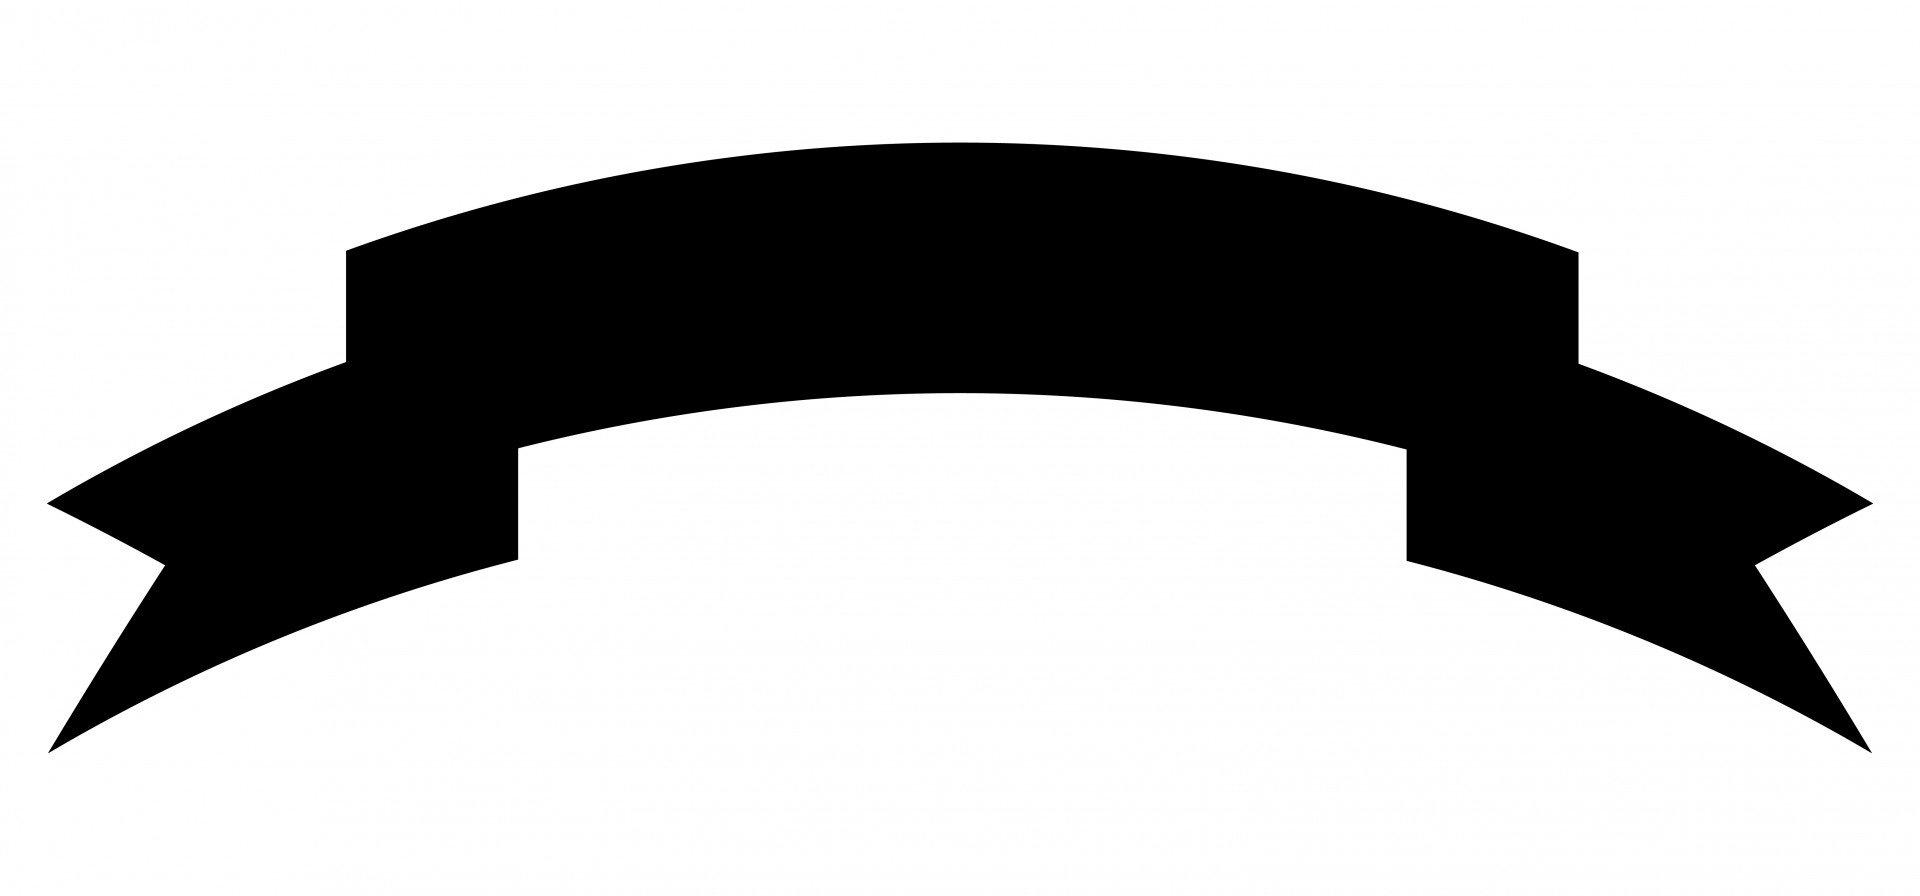 1920x896 Ribbon Banner Silhouette Free Design Templates